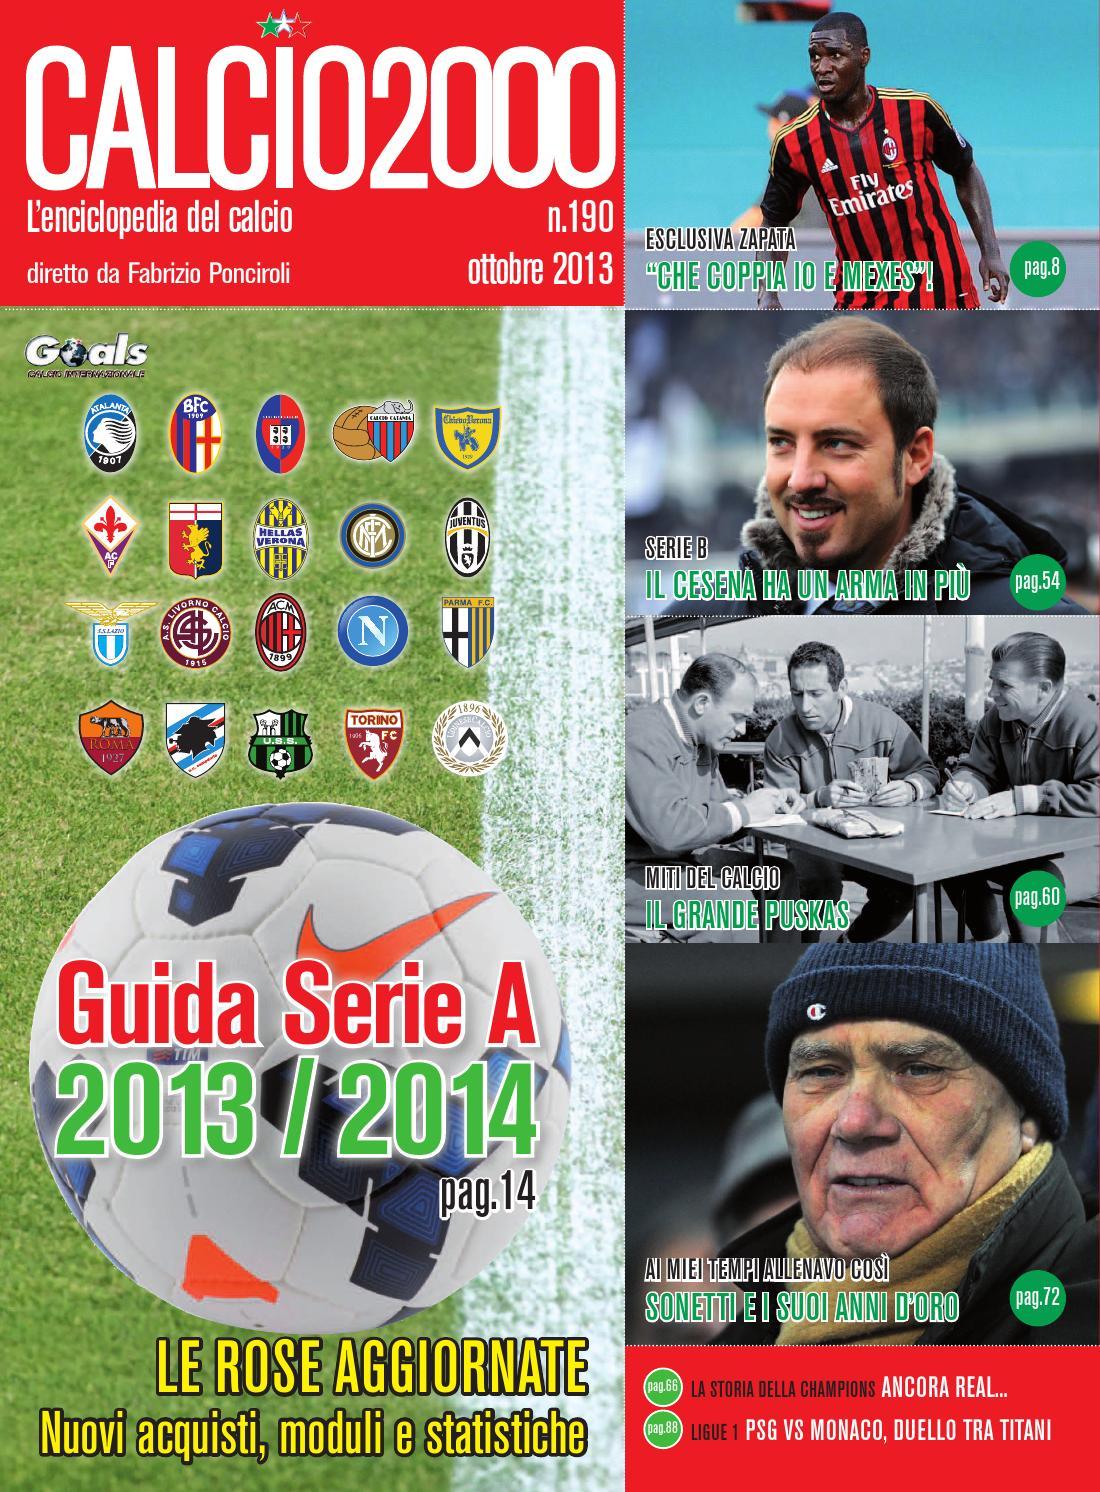 Calcio2000 Magazine 190 By Fabrizio Ponciroli Issuu